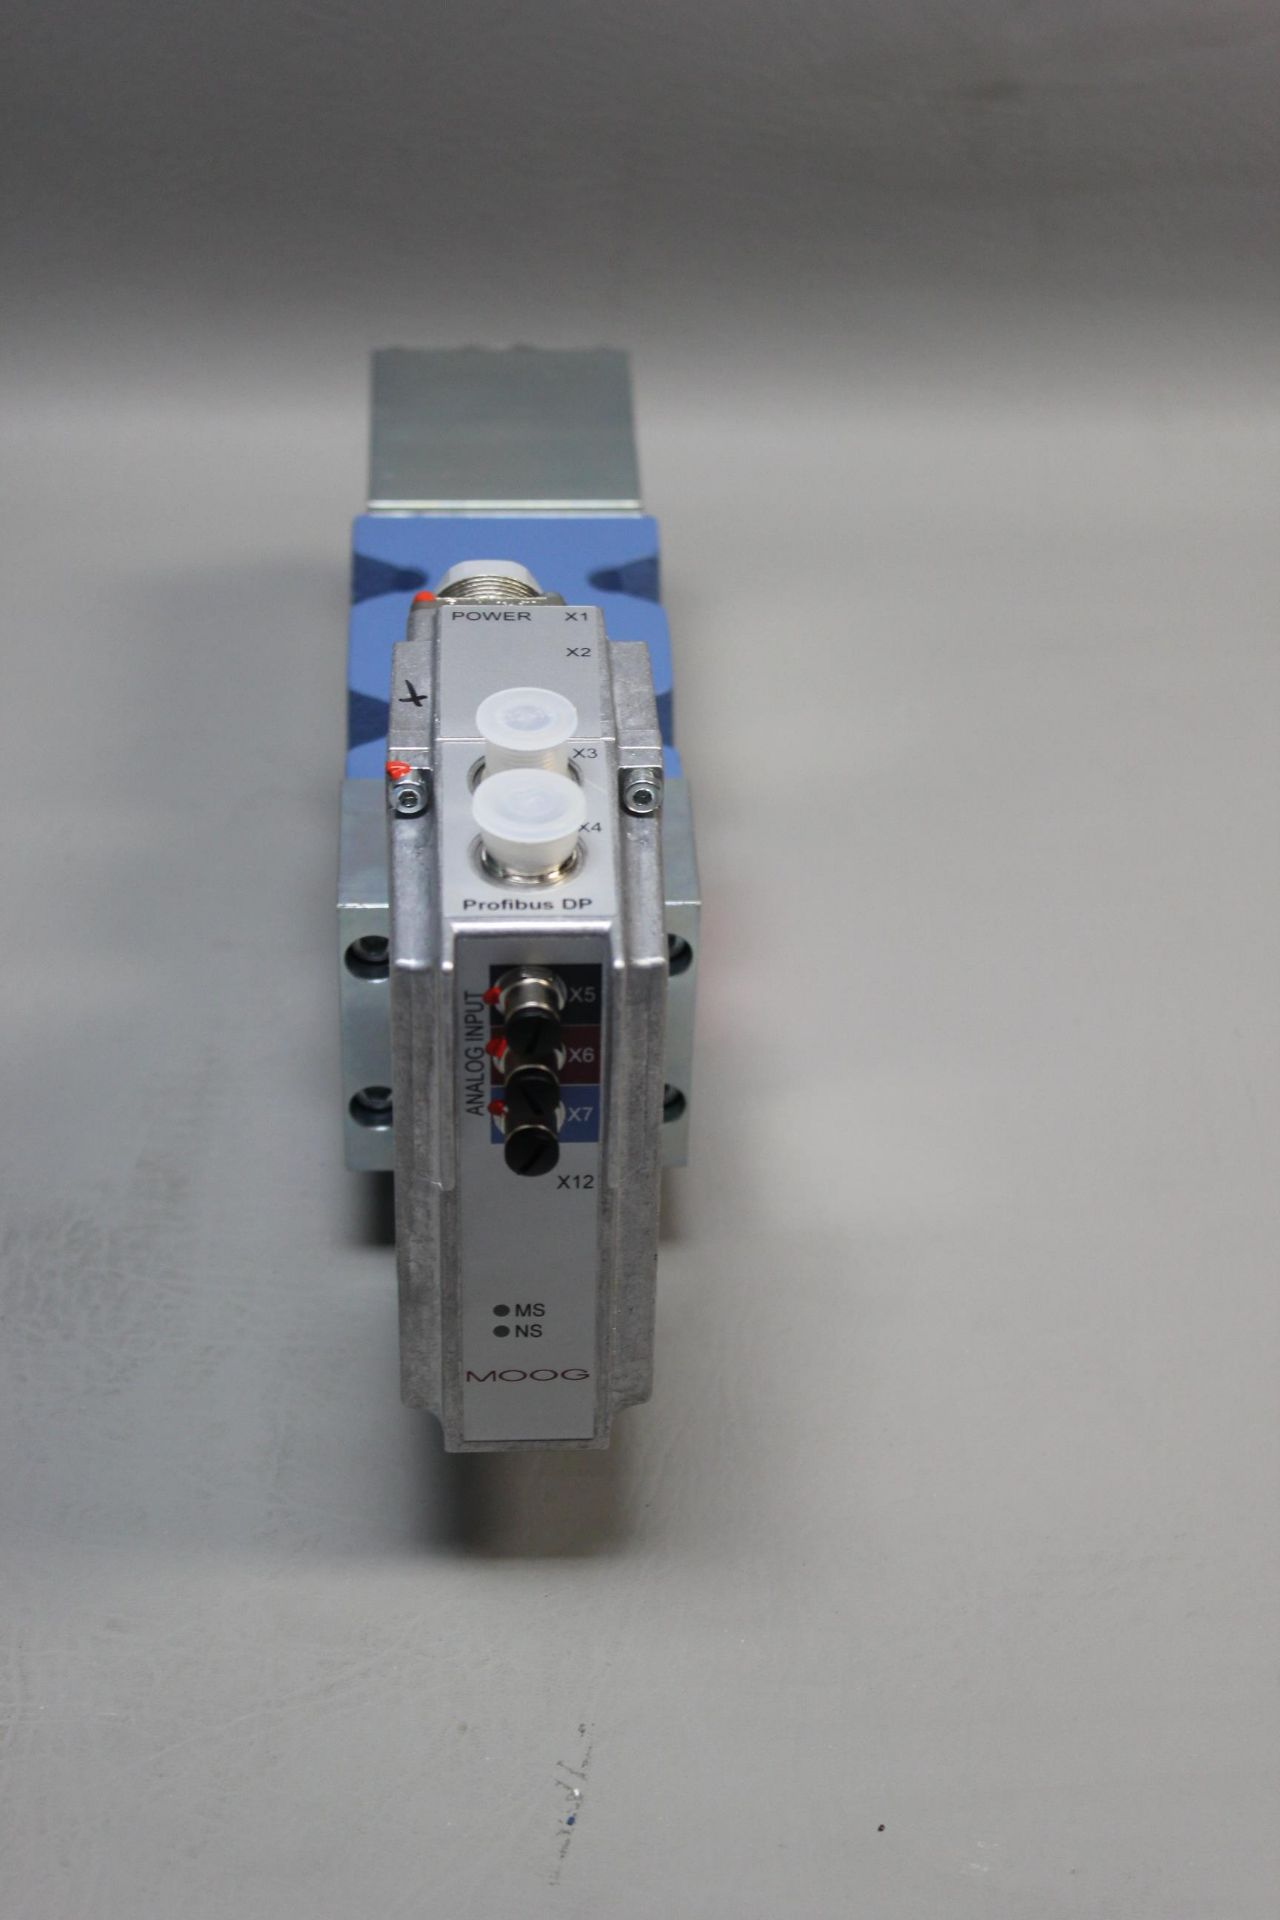 NEW MOOG DIRECT DRIVE DIGITAL CONTROL HYDRAULIC SERVO VALVE - Image 9 of 15